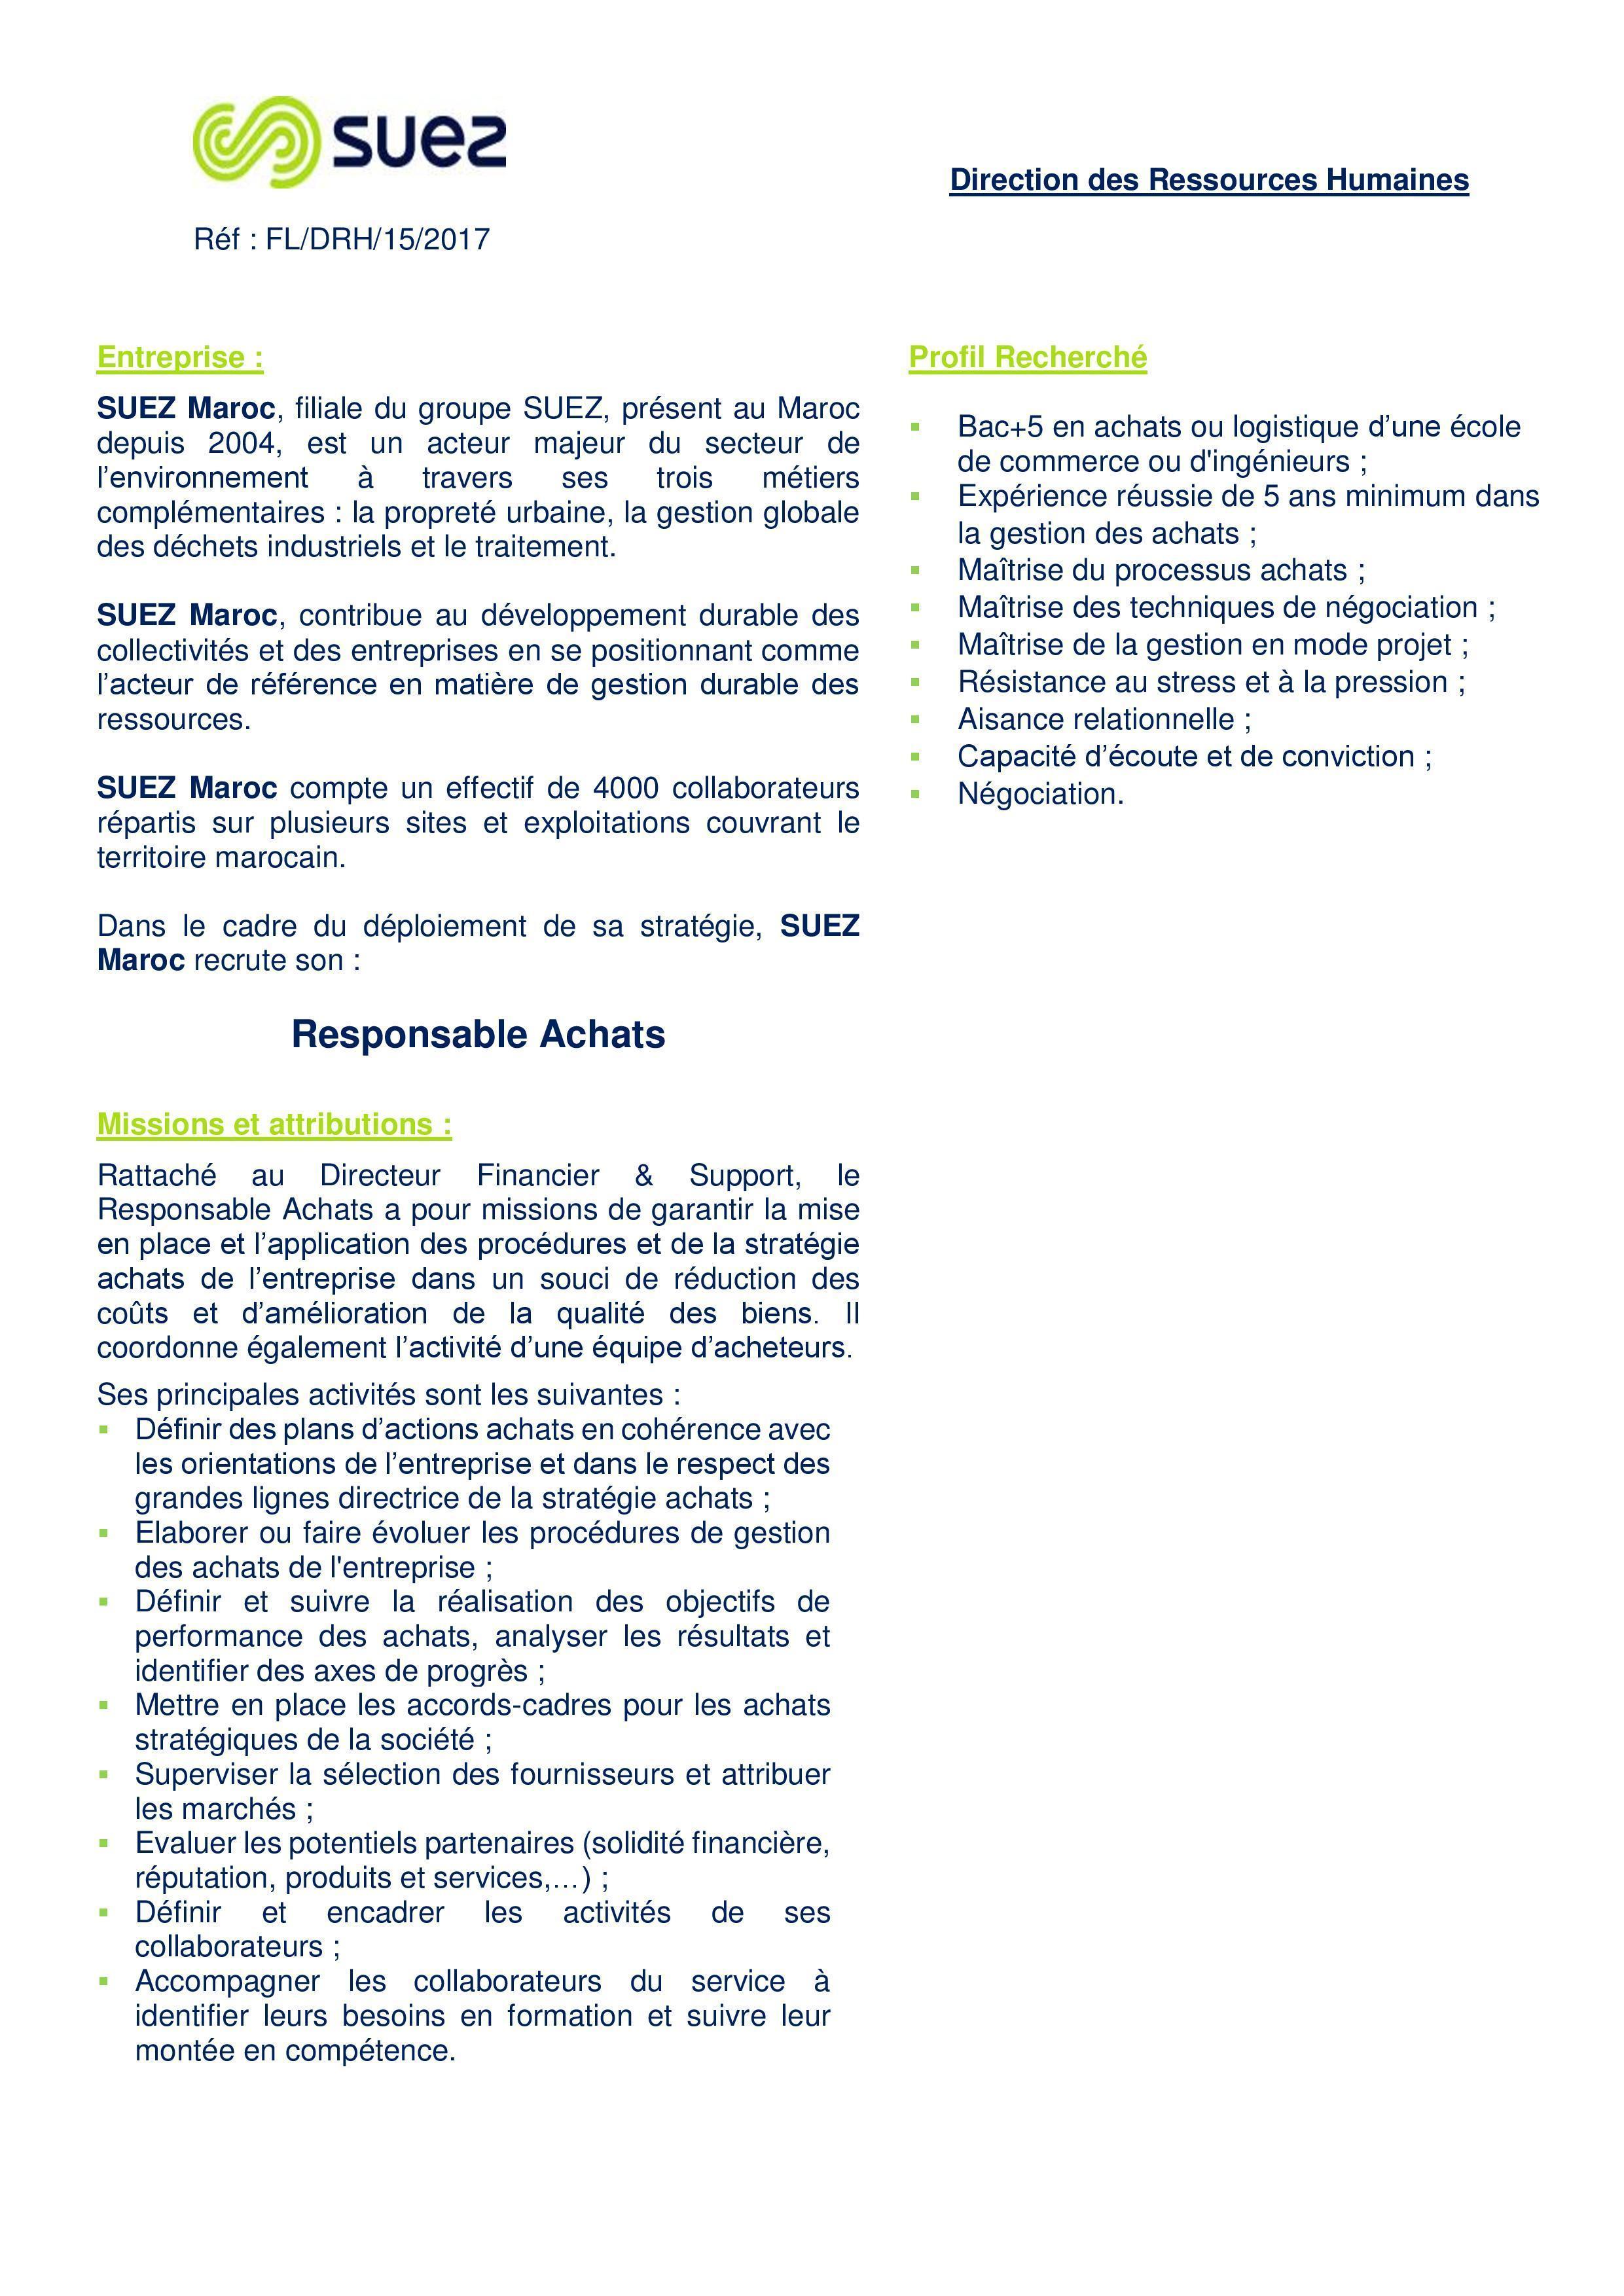 Responsable Achat Suez - Dreamjob.ma